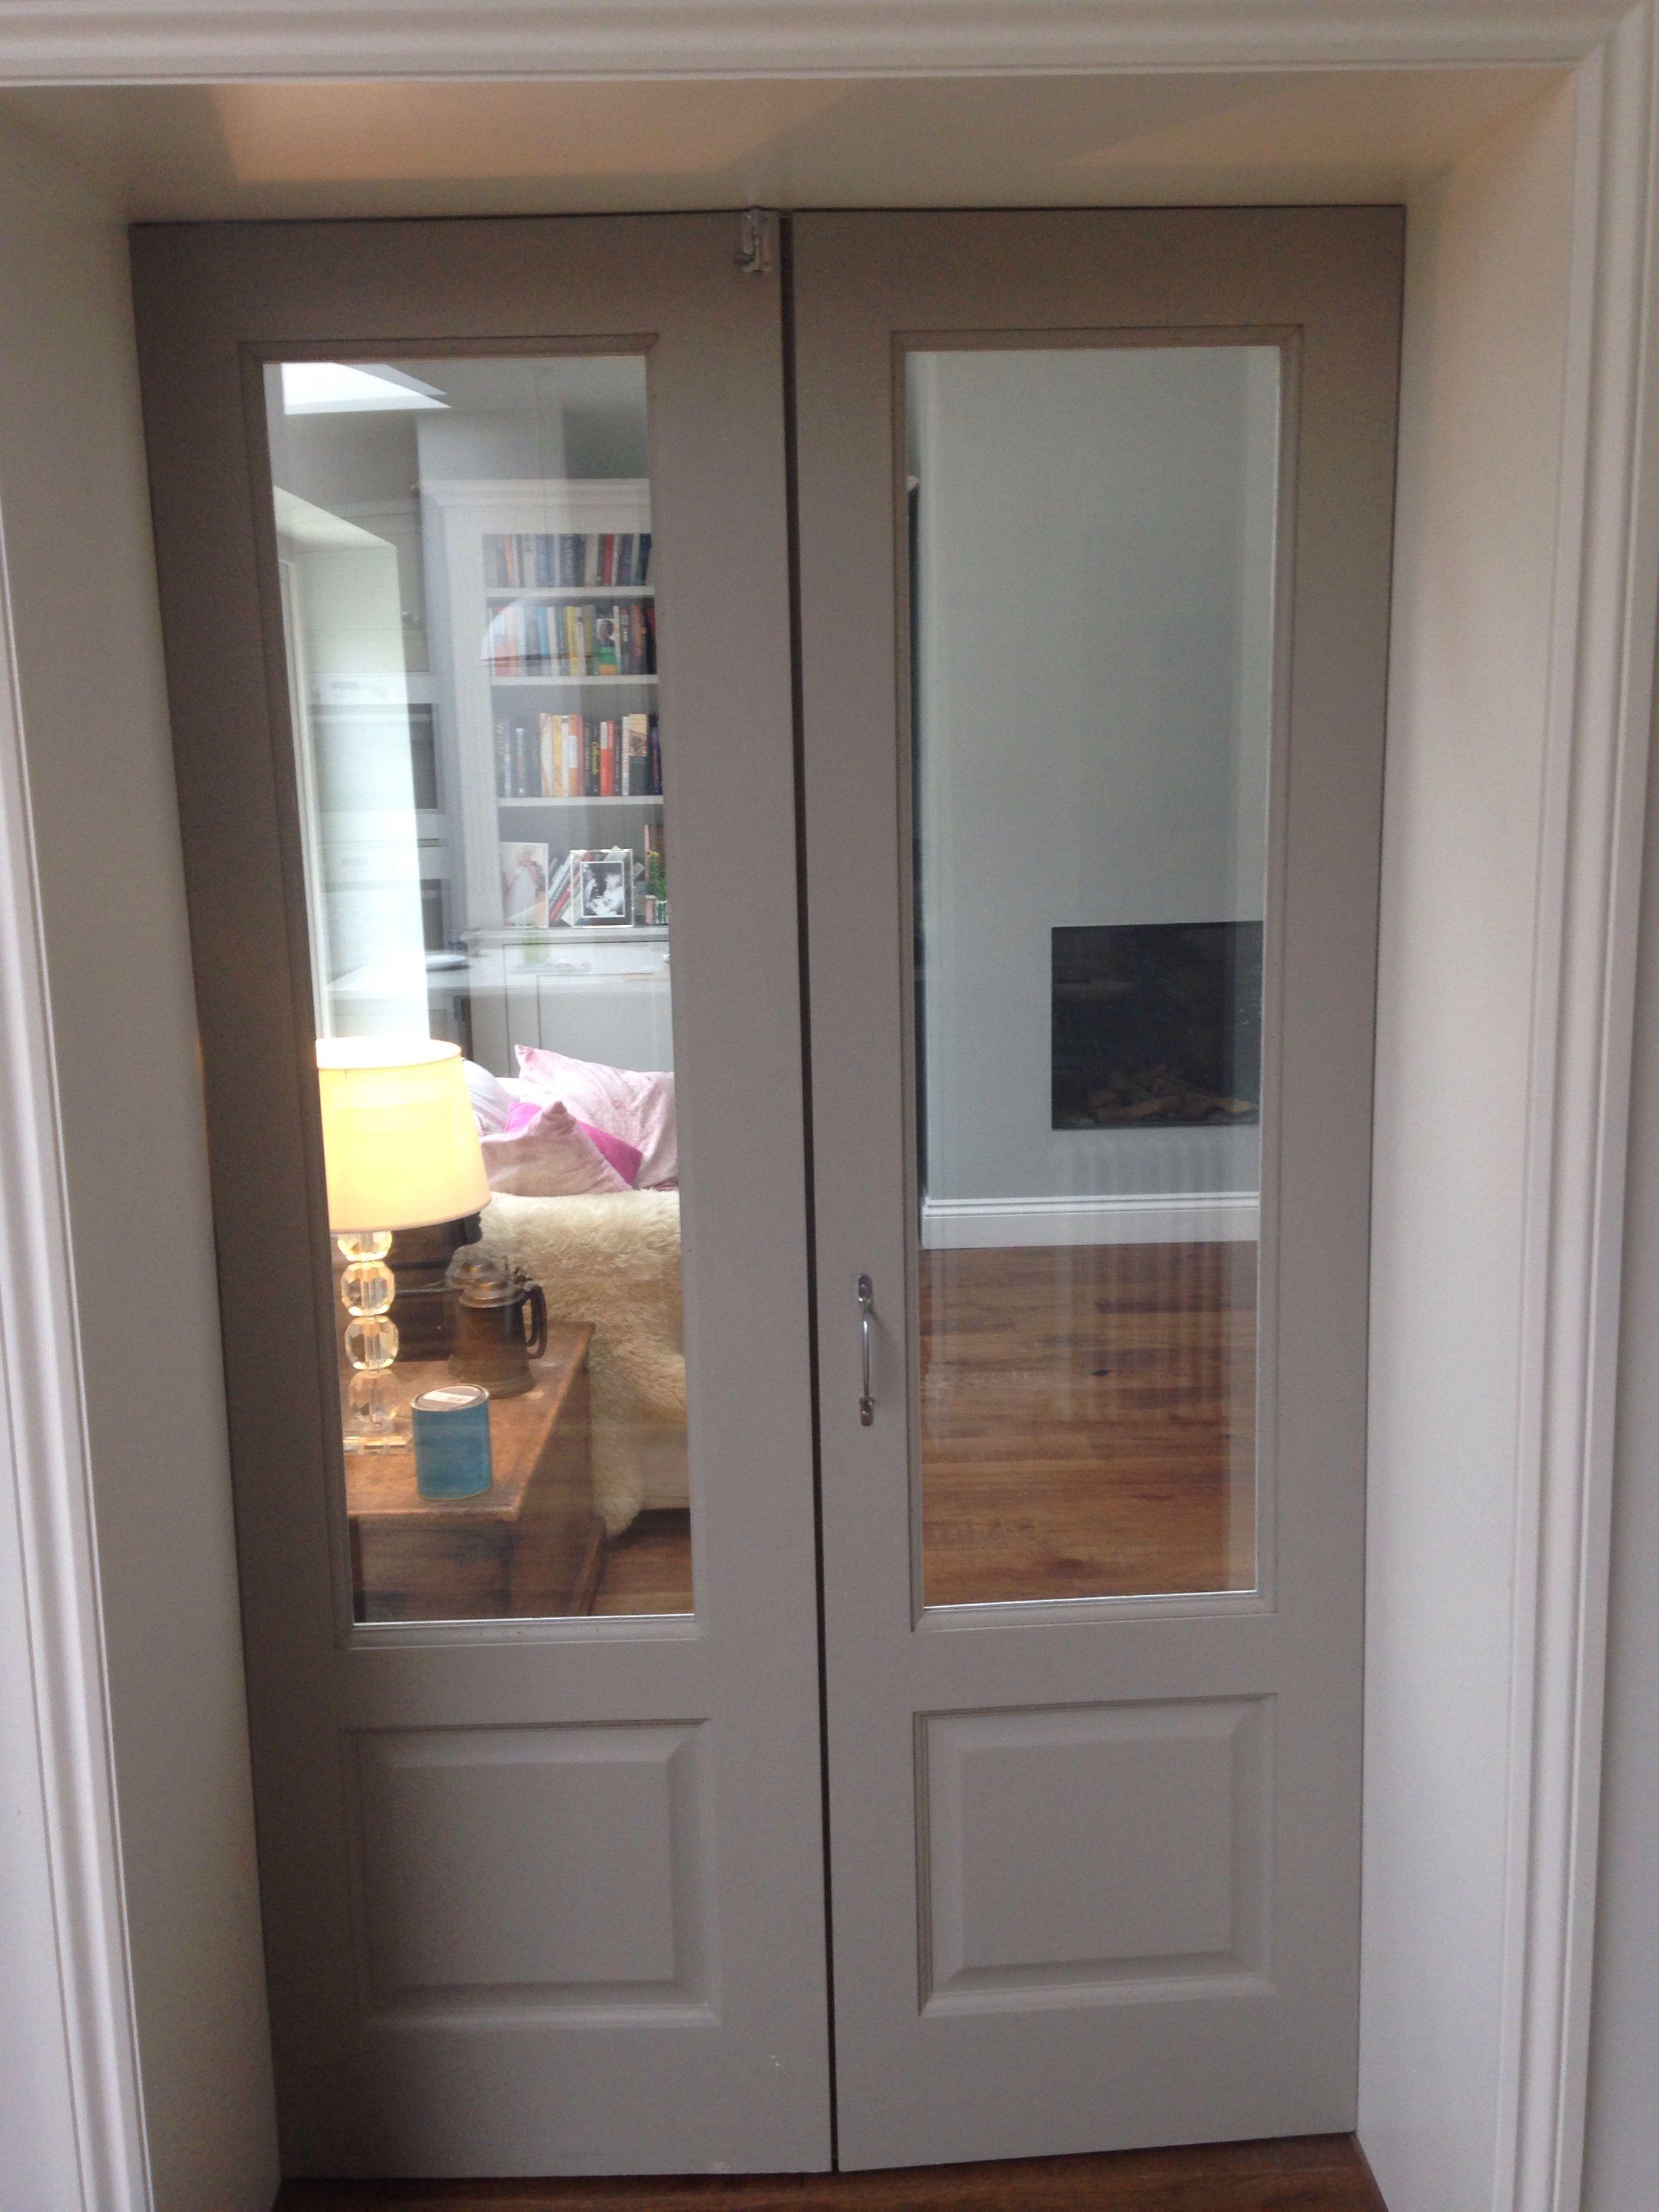 My Interior Glazed Doors Painted Hardwick White Farrow Ball